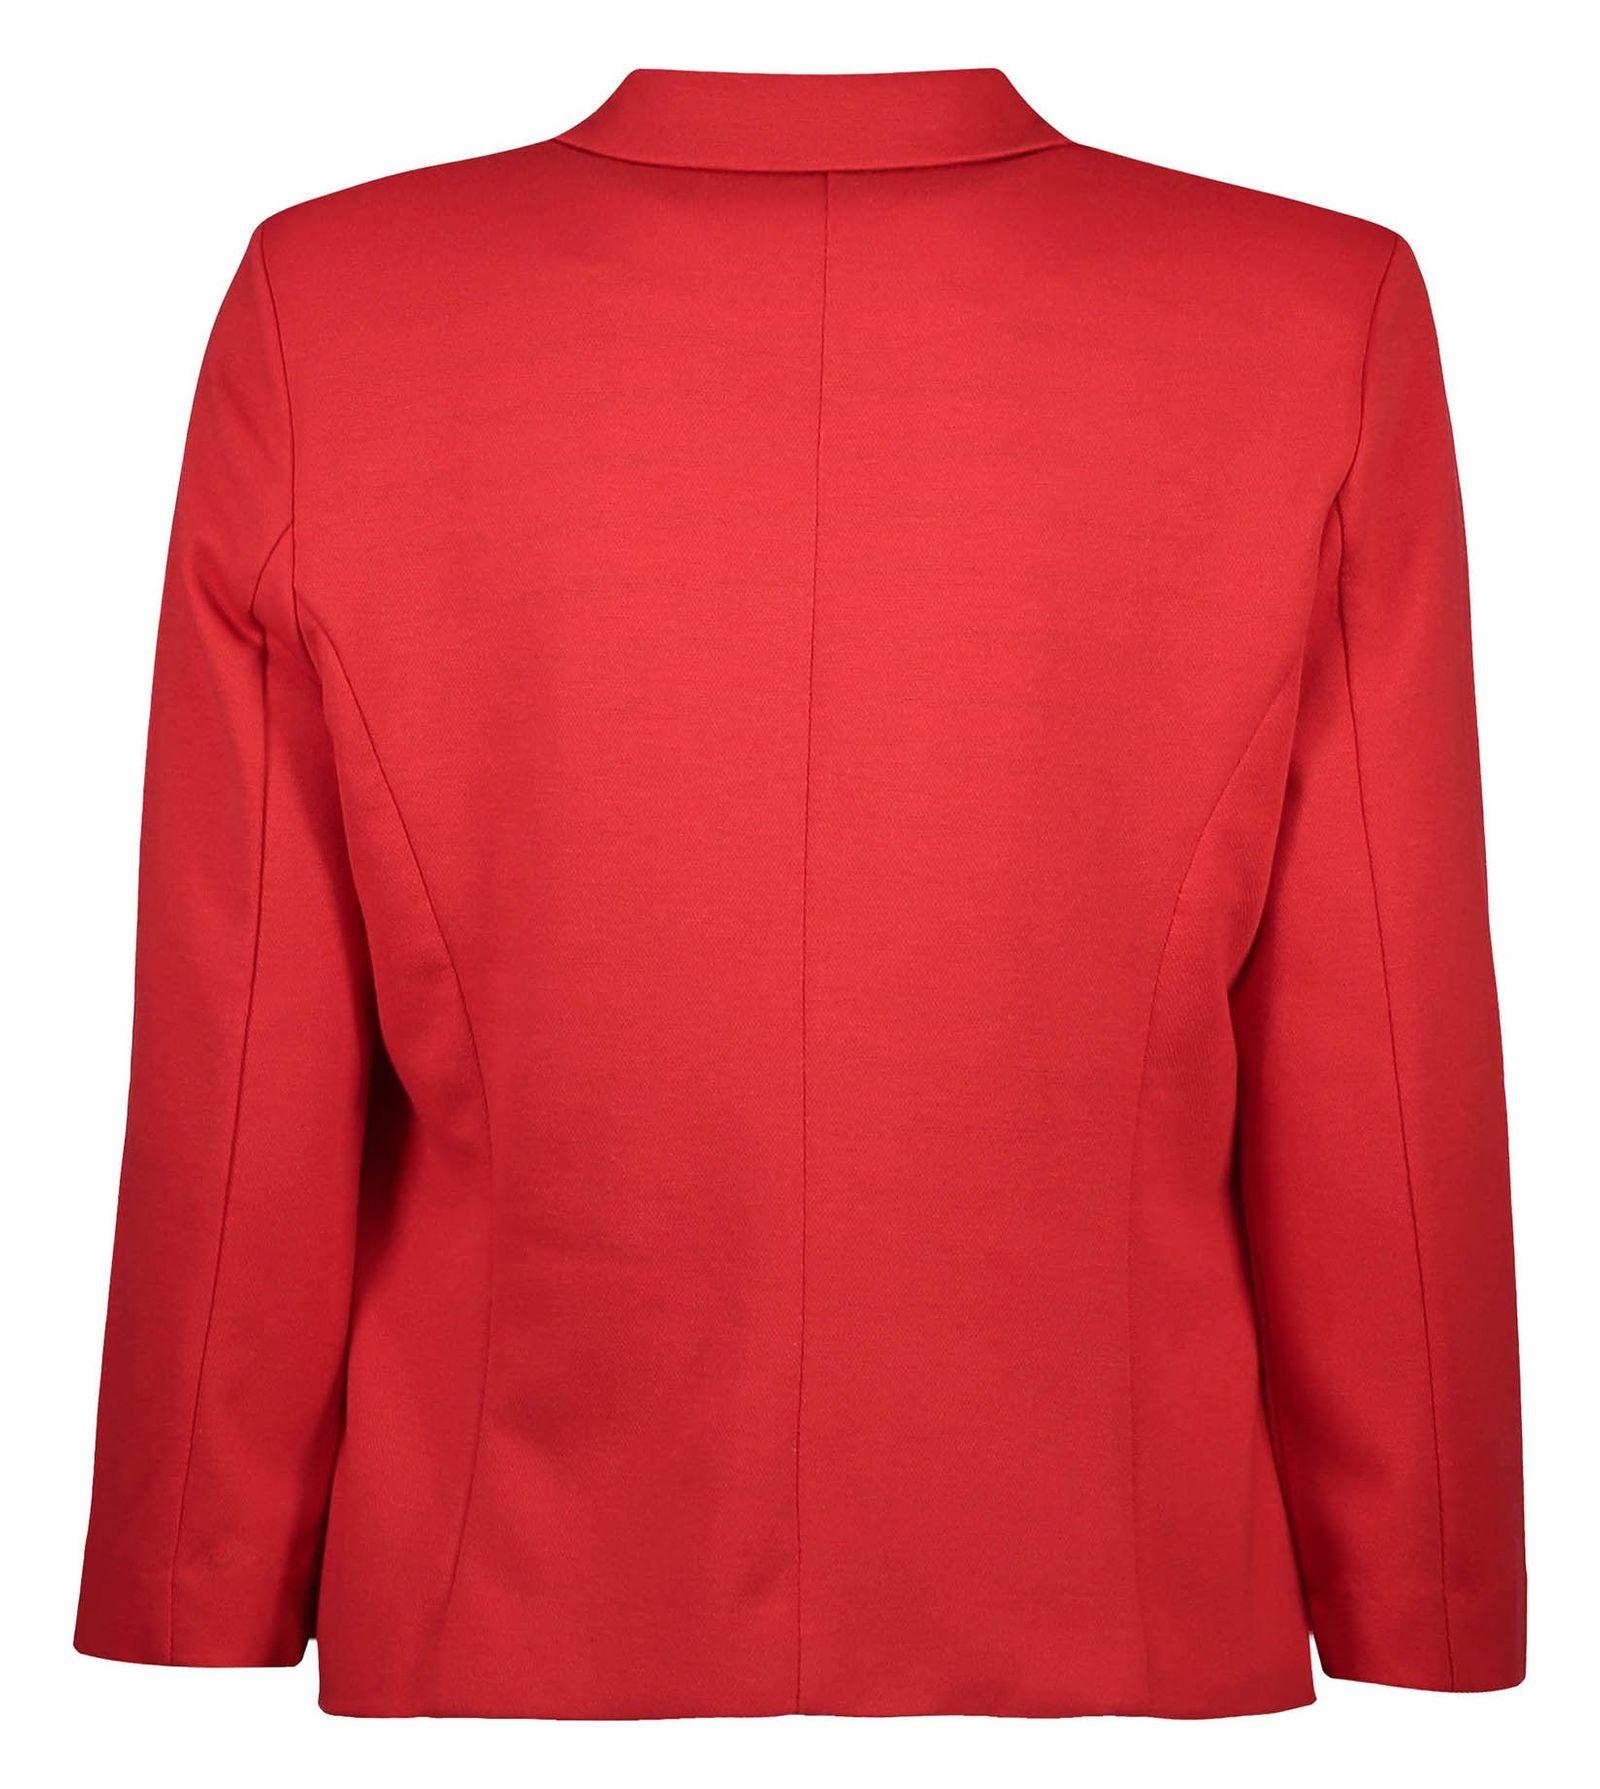 کت کوتاه زنانه - جنیفر - قرمز - 2